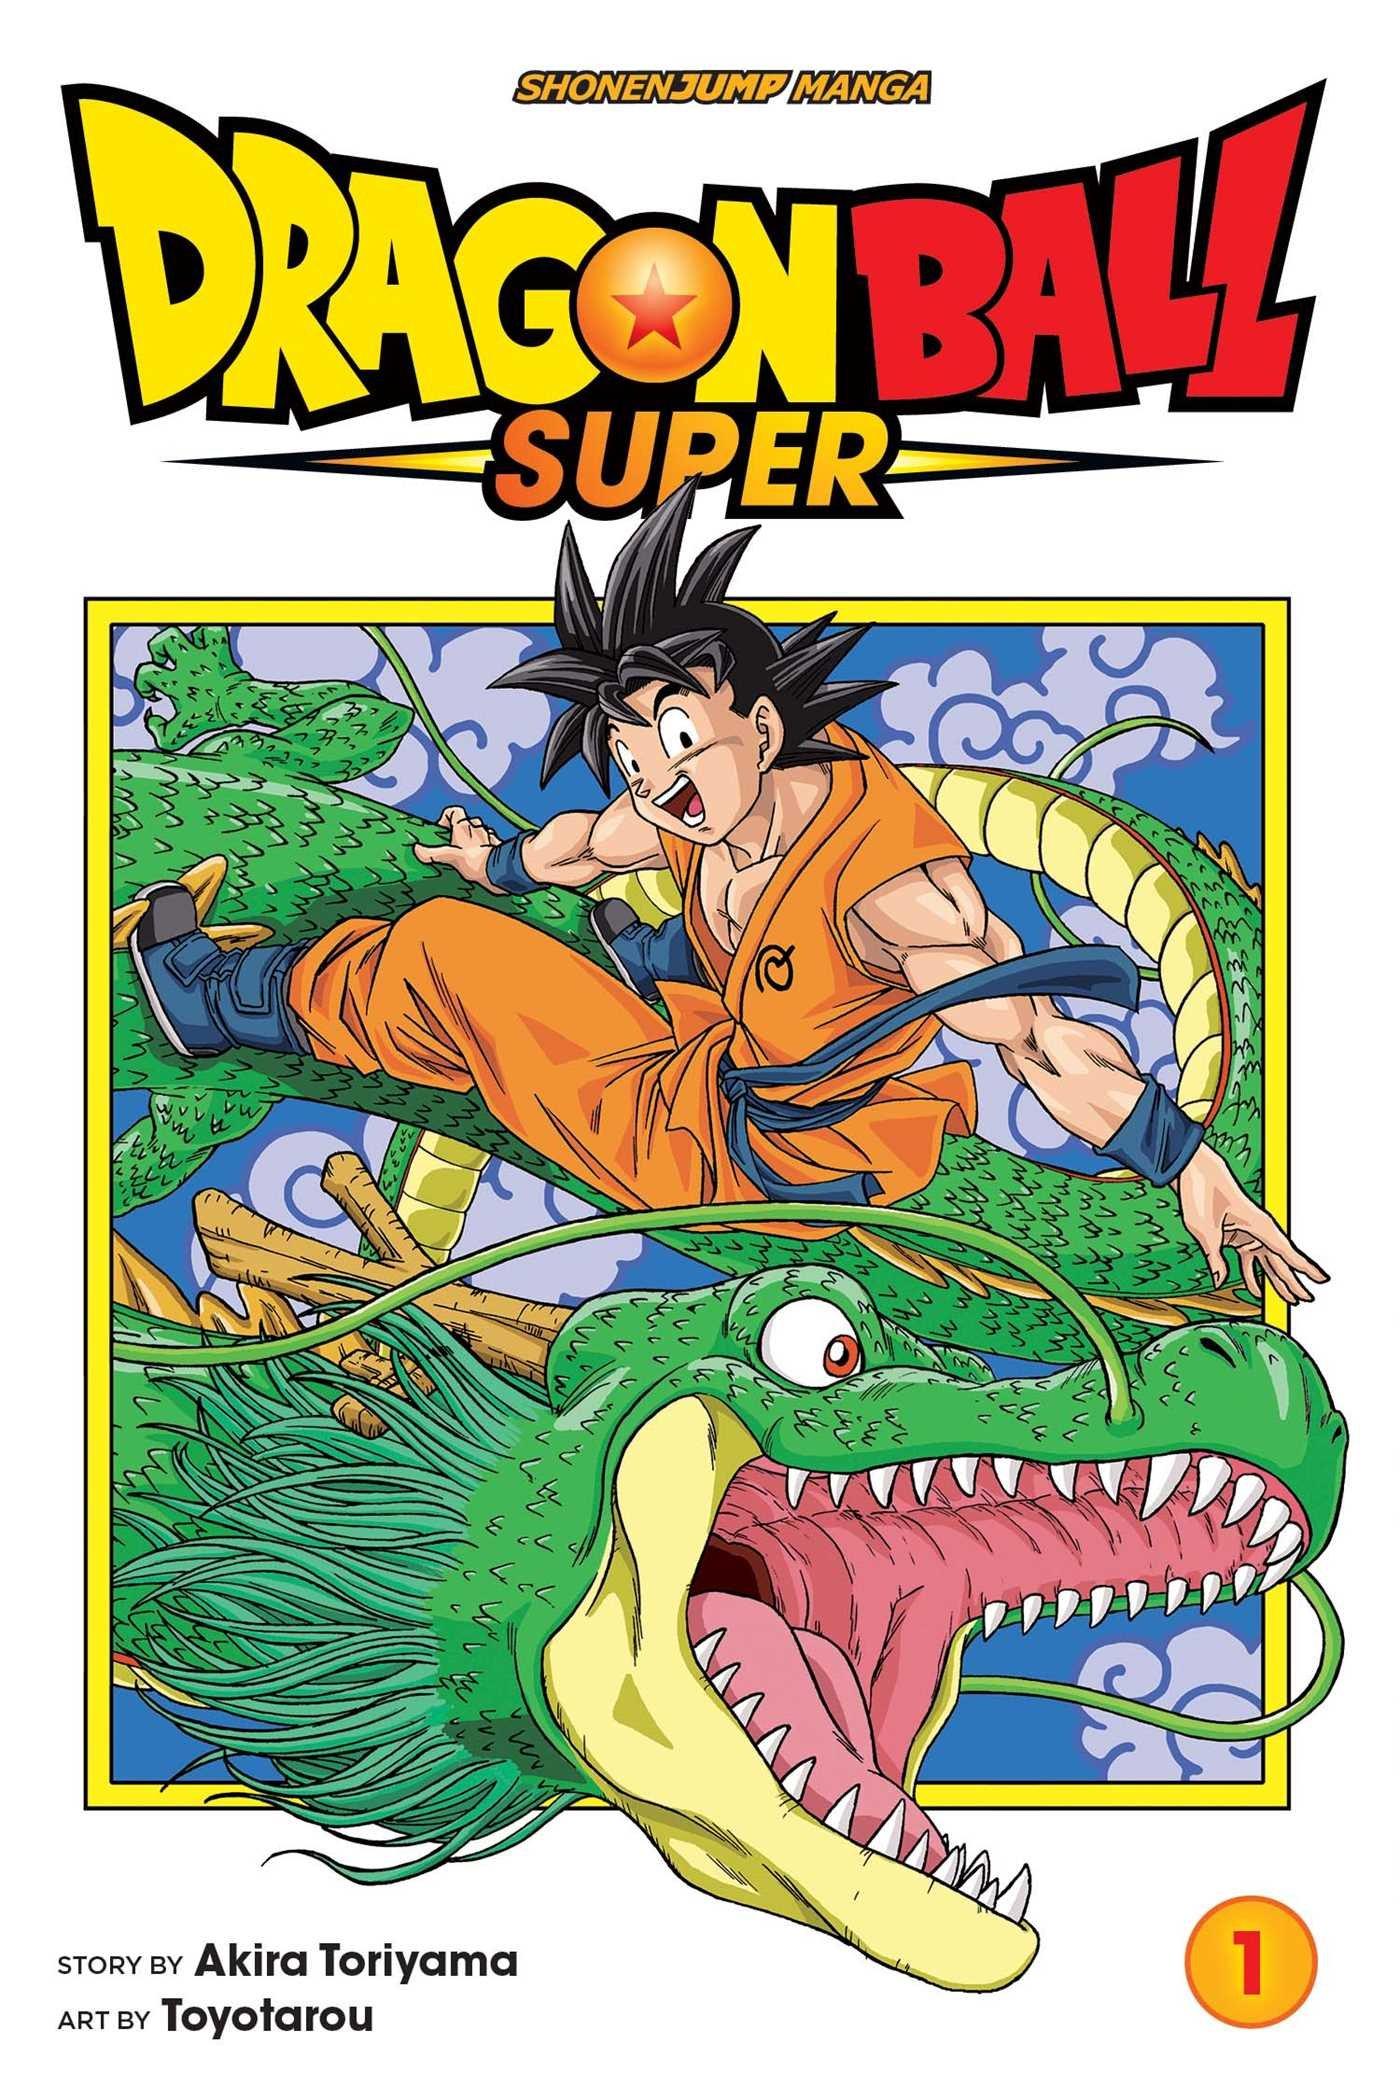 Amazon Com Dragon Ball Super Vol 1 1 9781421592541 Toriyama Akira Toyotarou Books